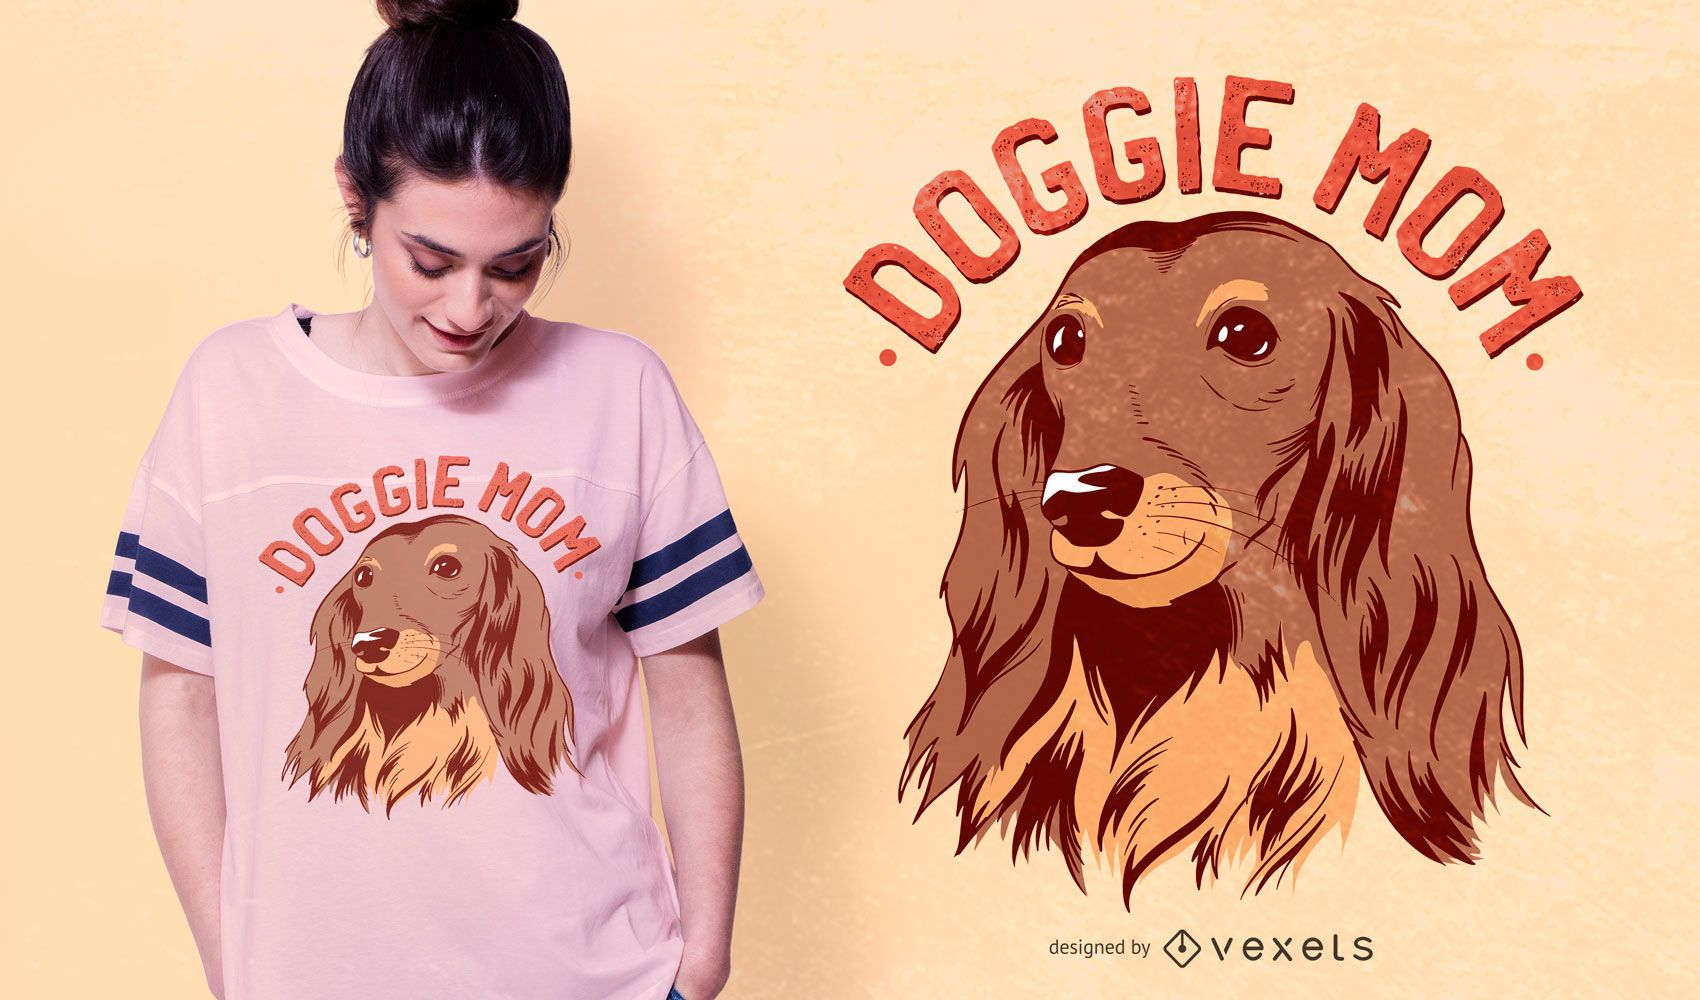 Dise?o de camiseta Doggie Mom Text